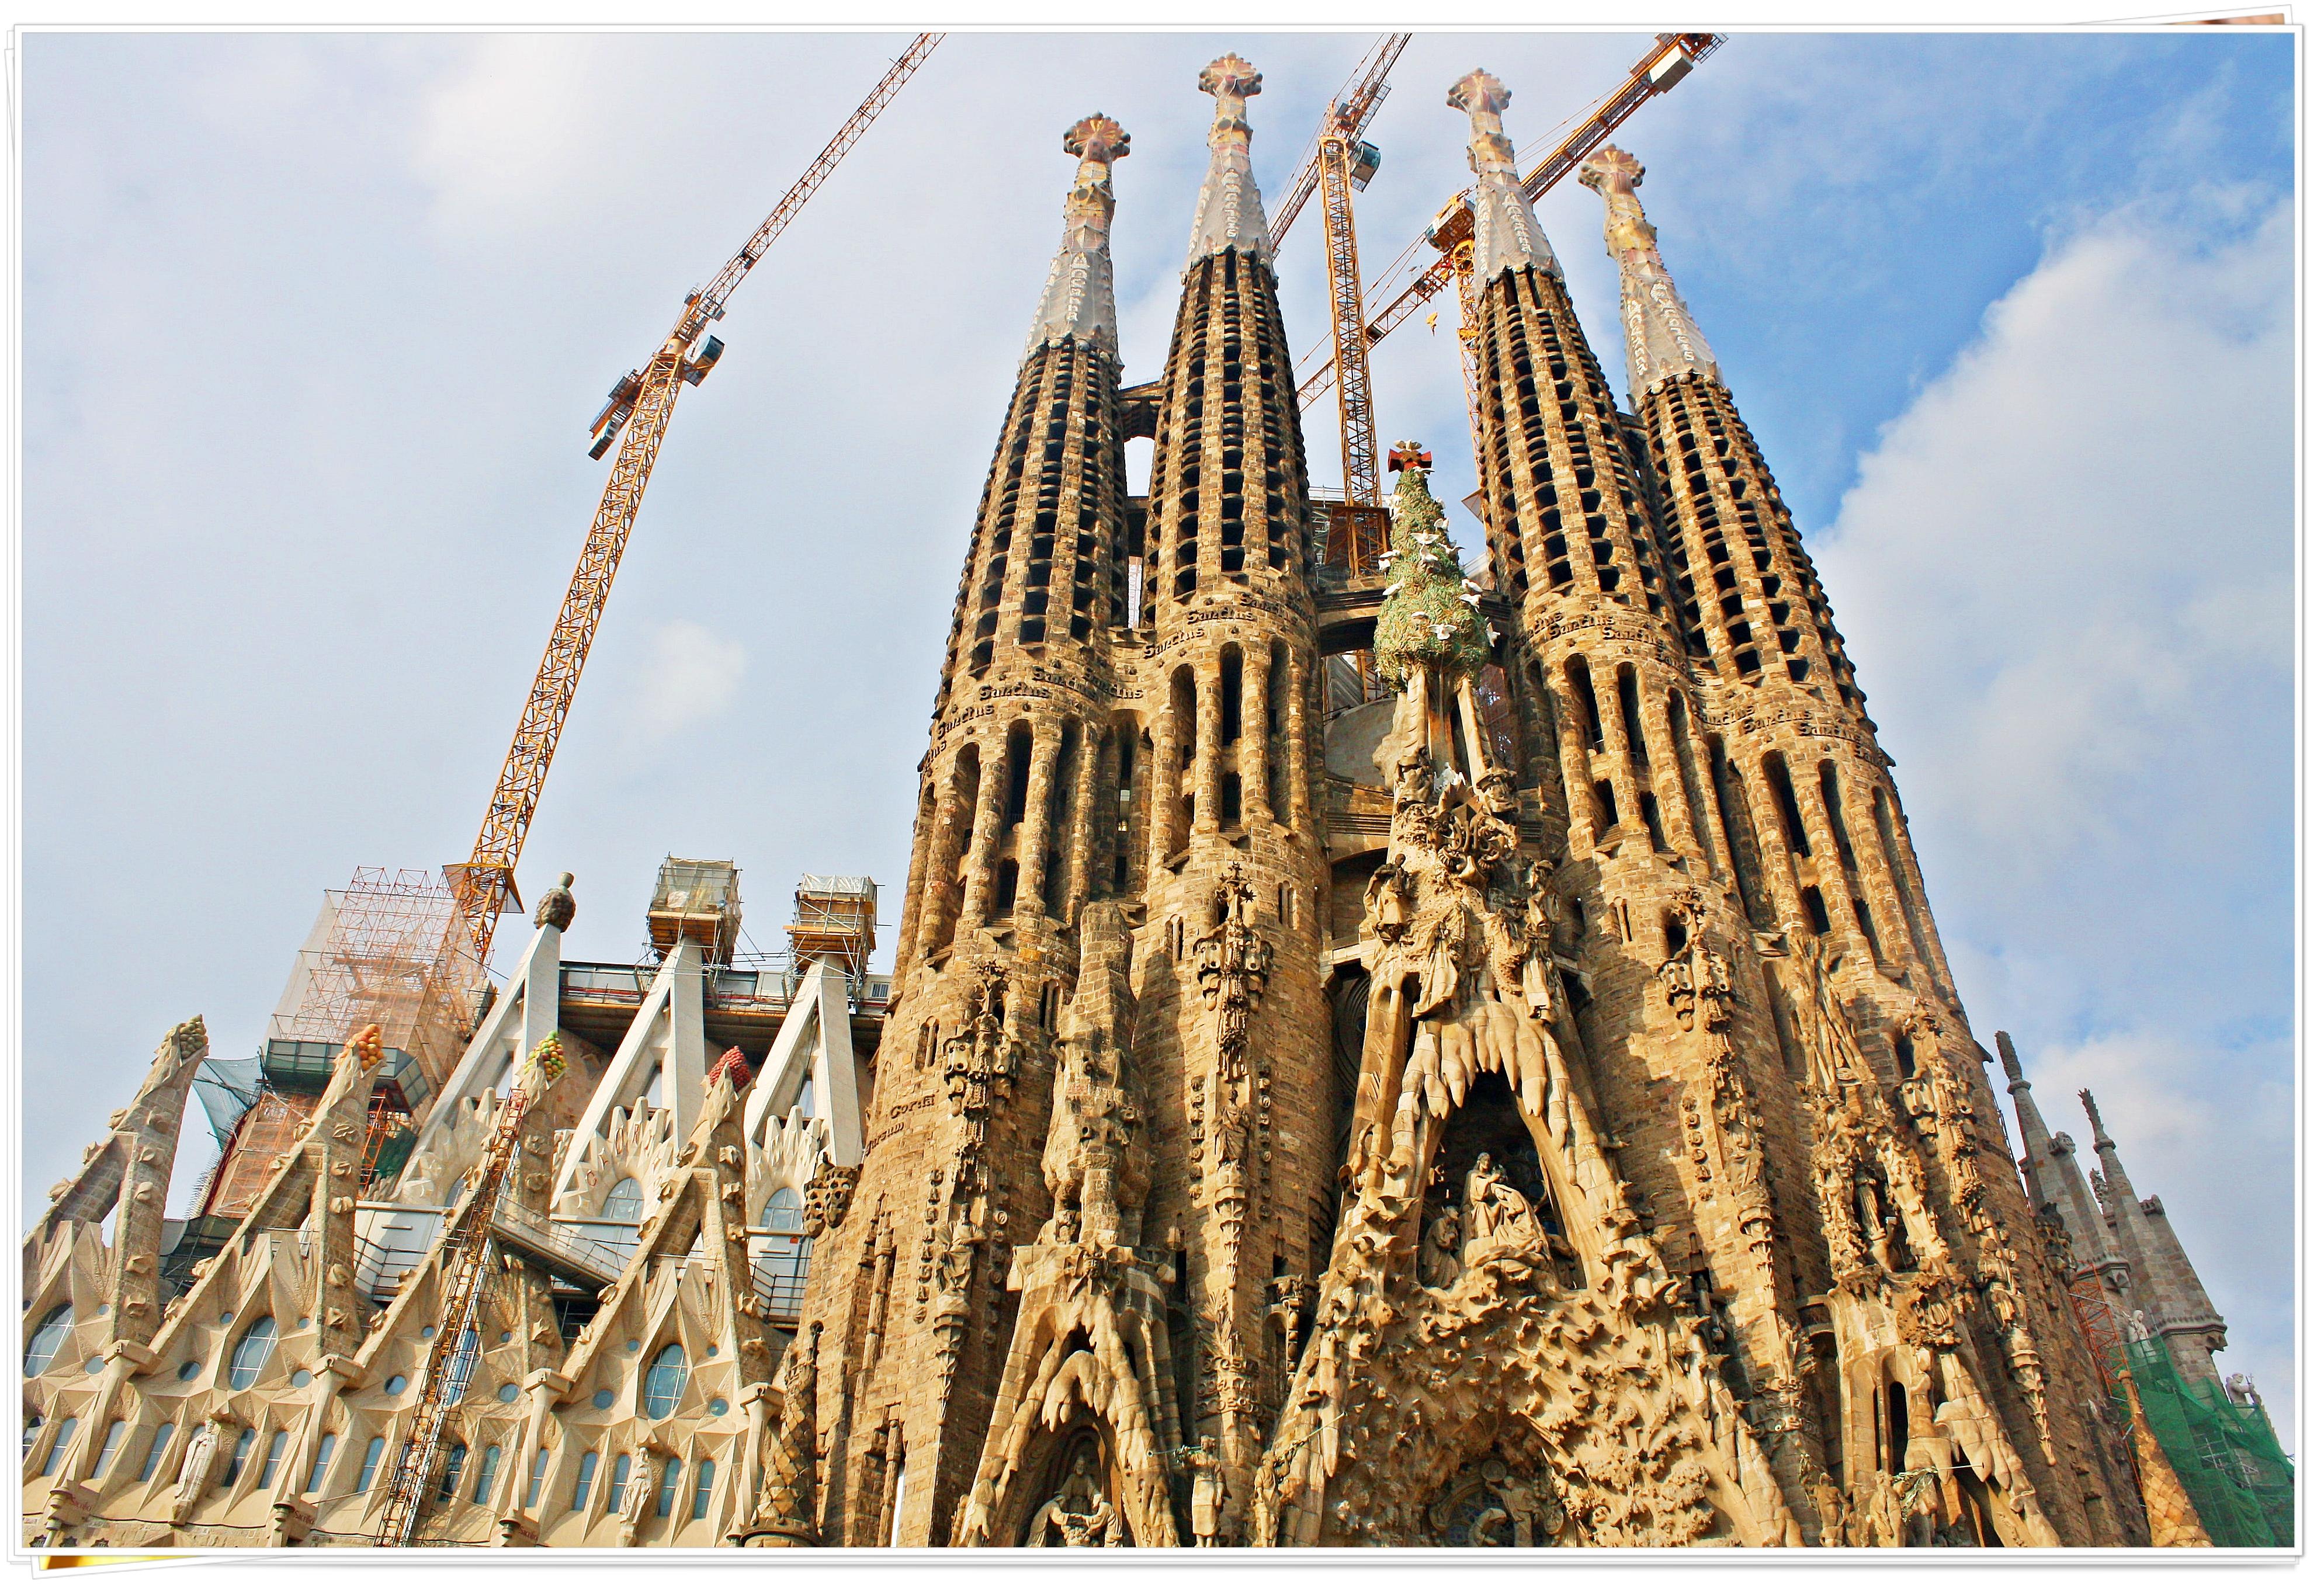 Basilica de la Sagrada Familia - Barcelona, Spain 2013